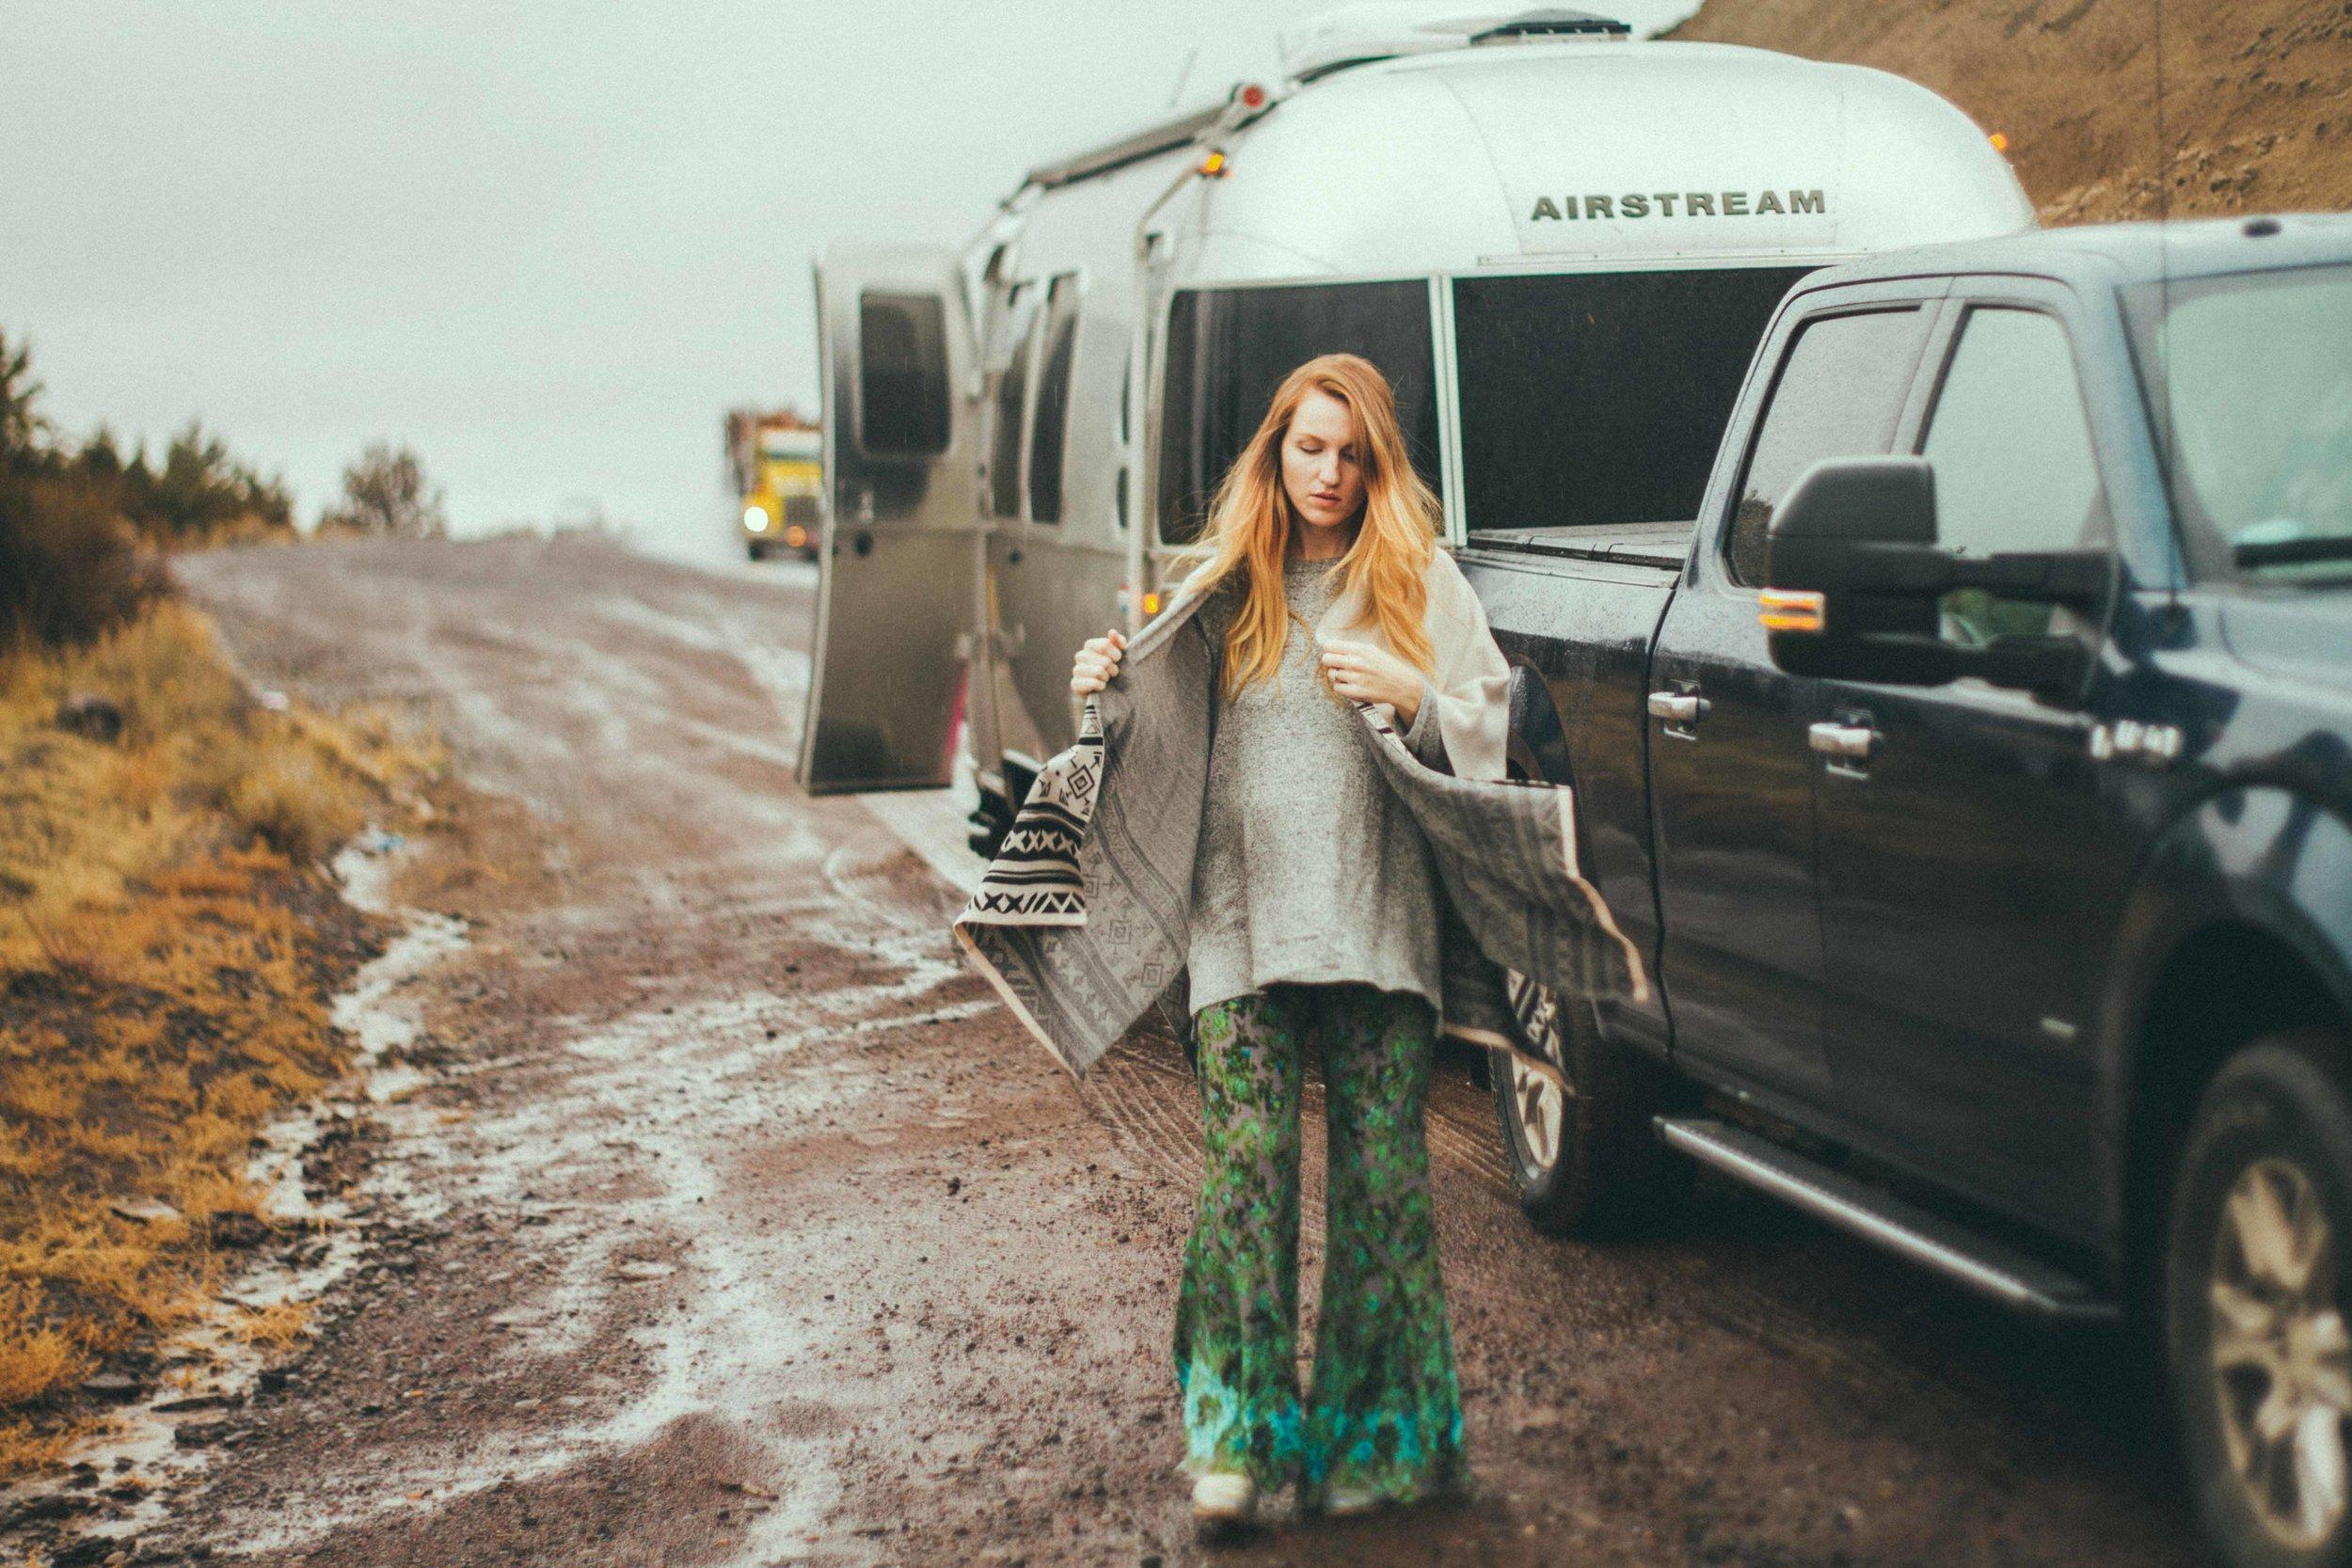 Pilgrim on Airstream's Endless Caravan - Exploring Oregon